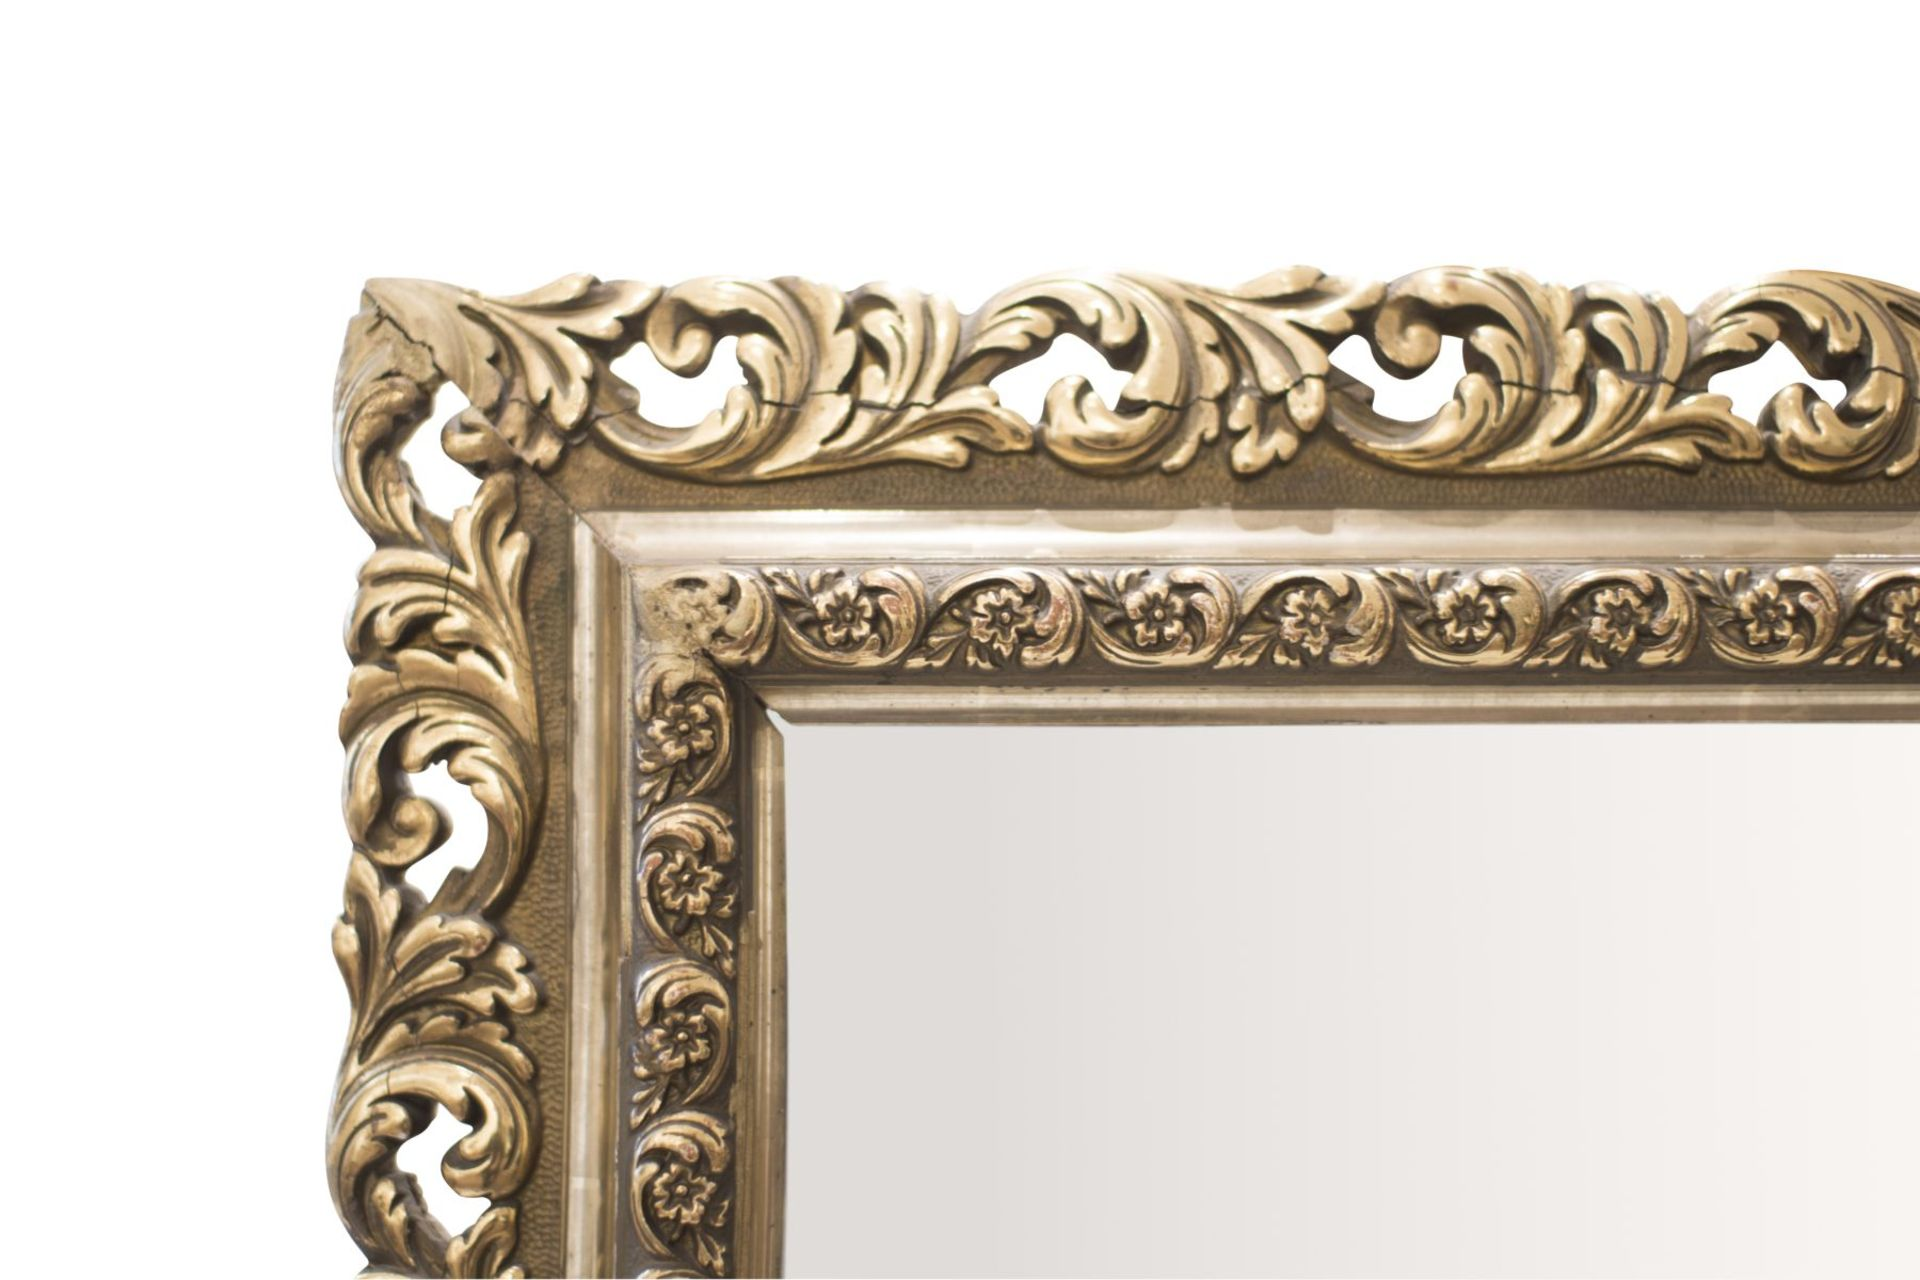 Decorative mirror - Image 3 of 5